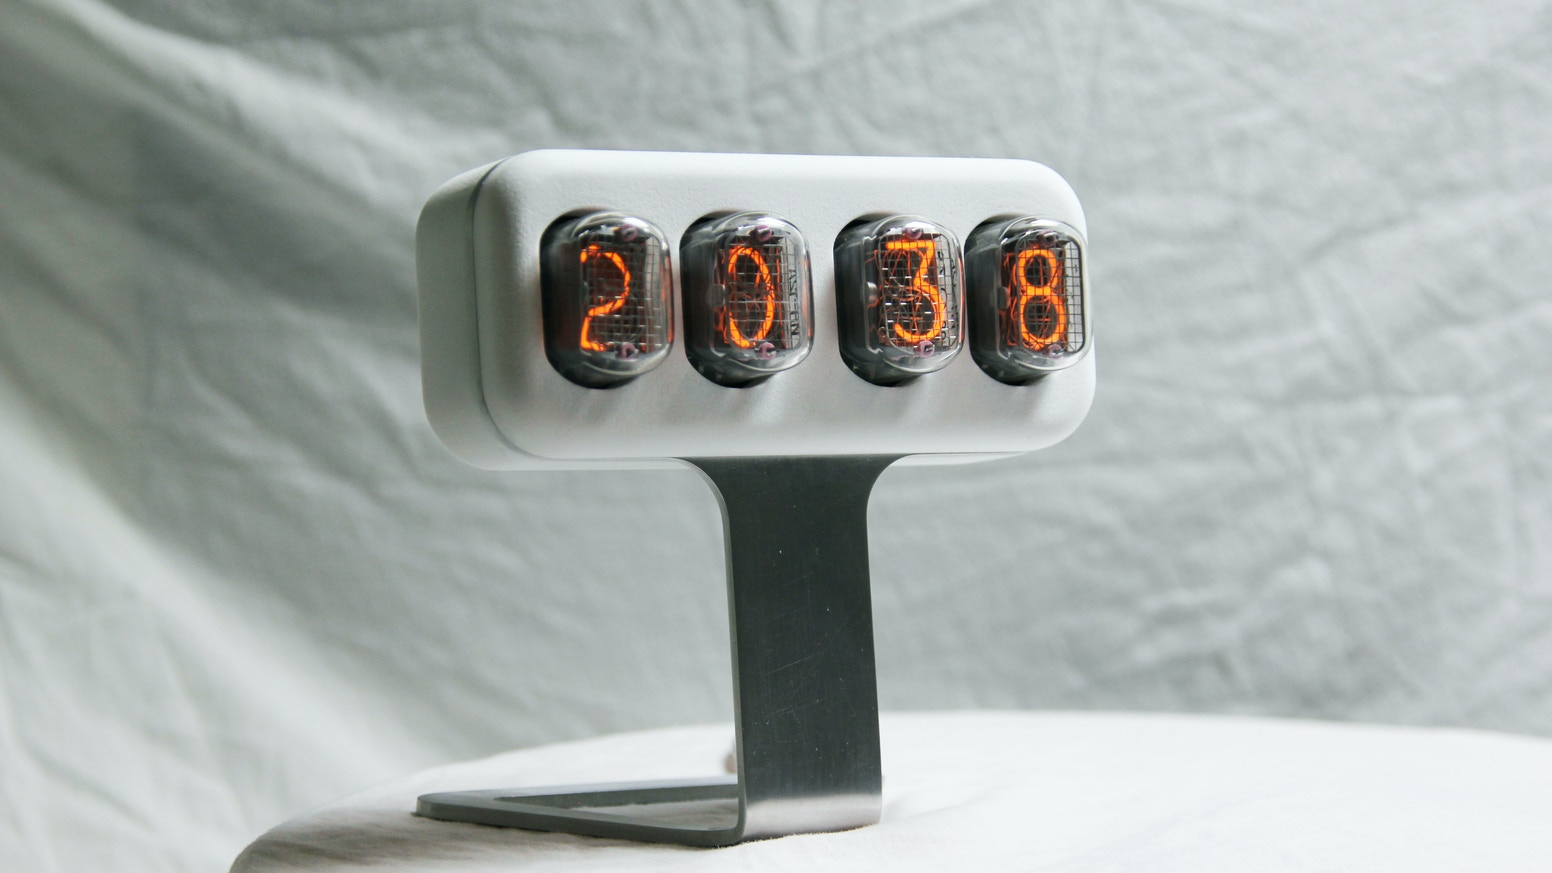 NIXLER: limited edition nixie tube clock